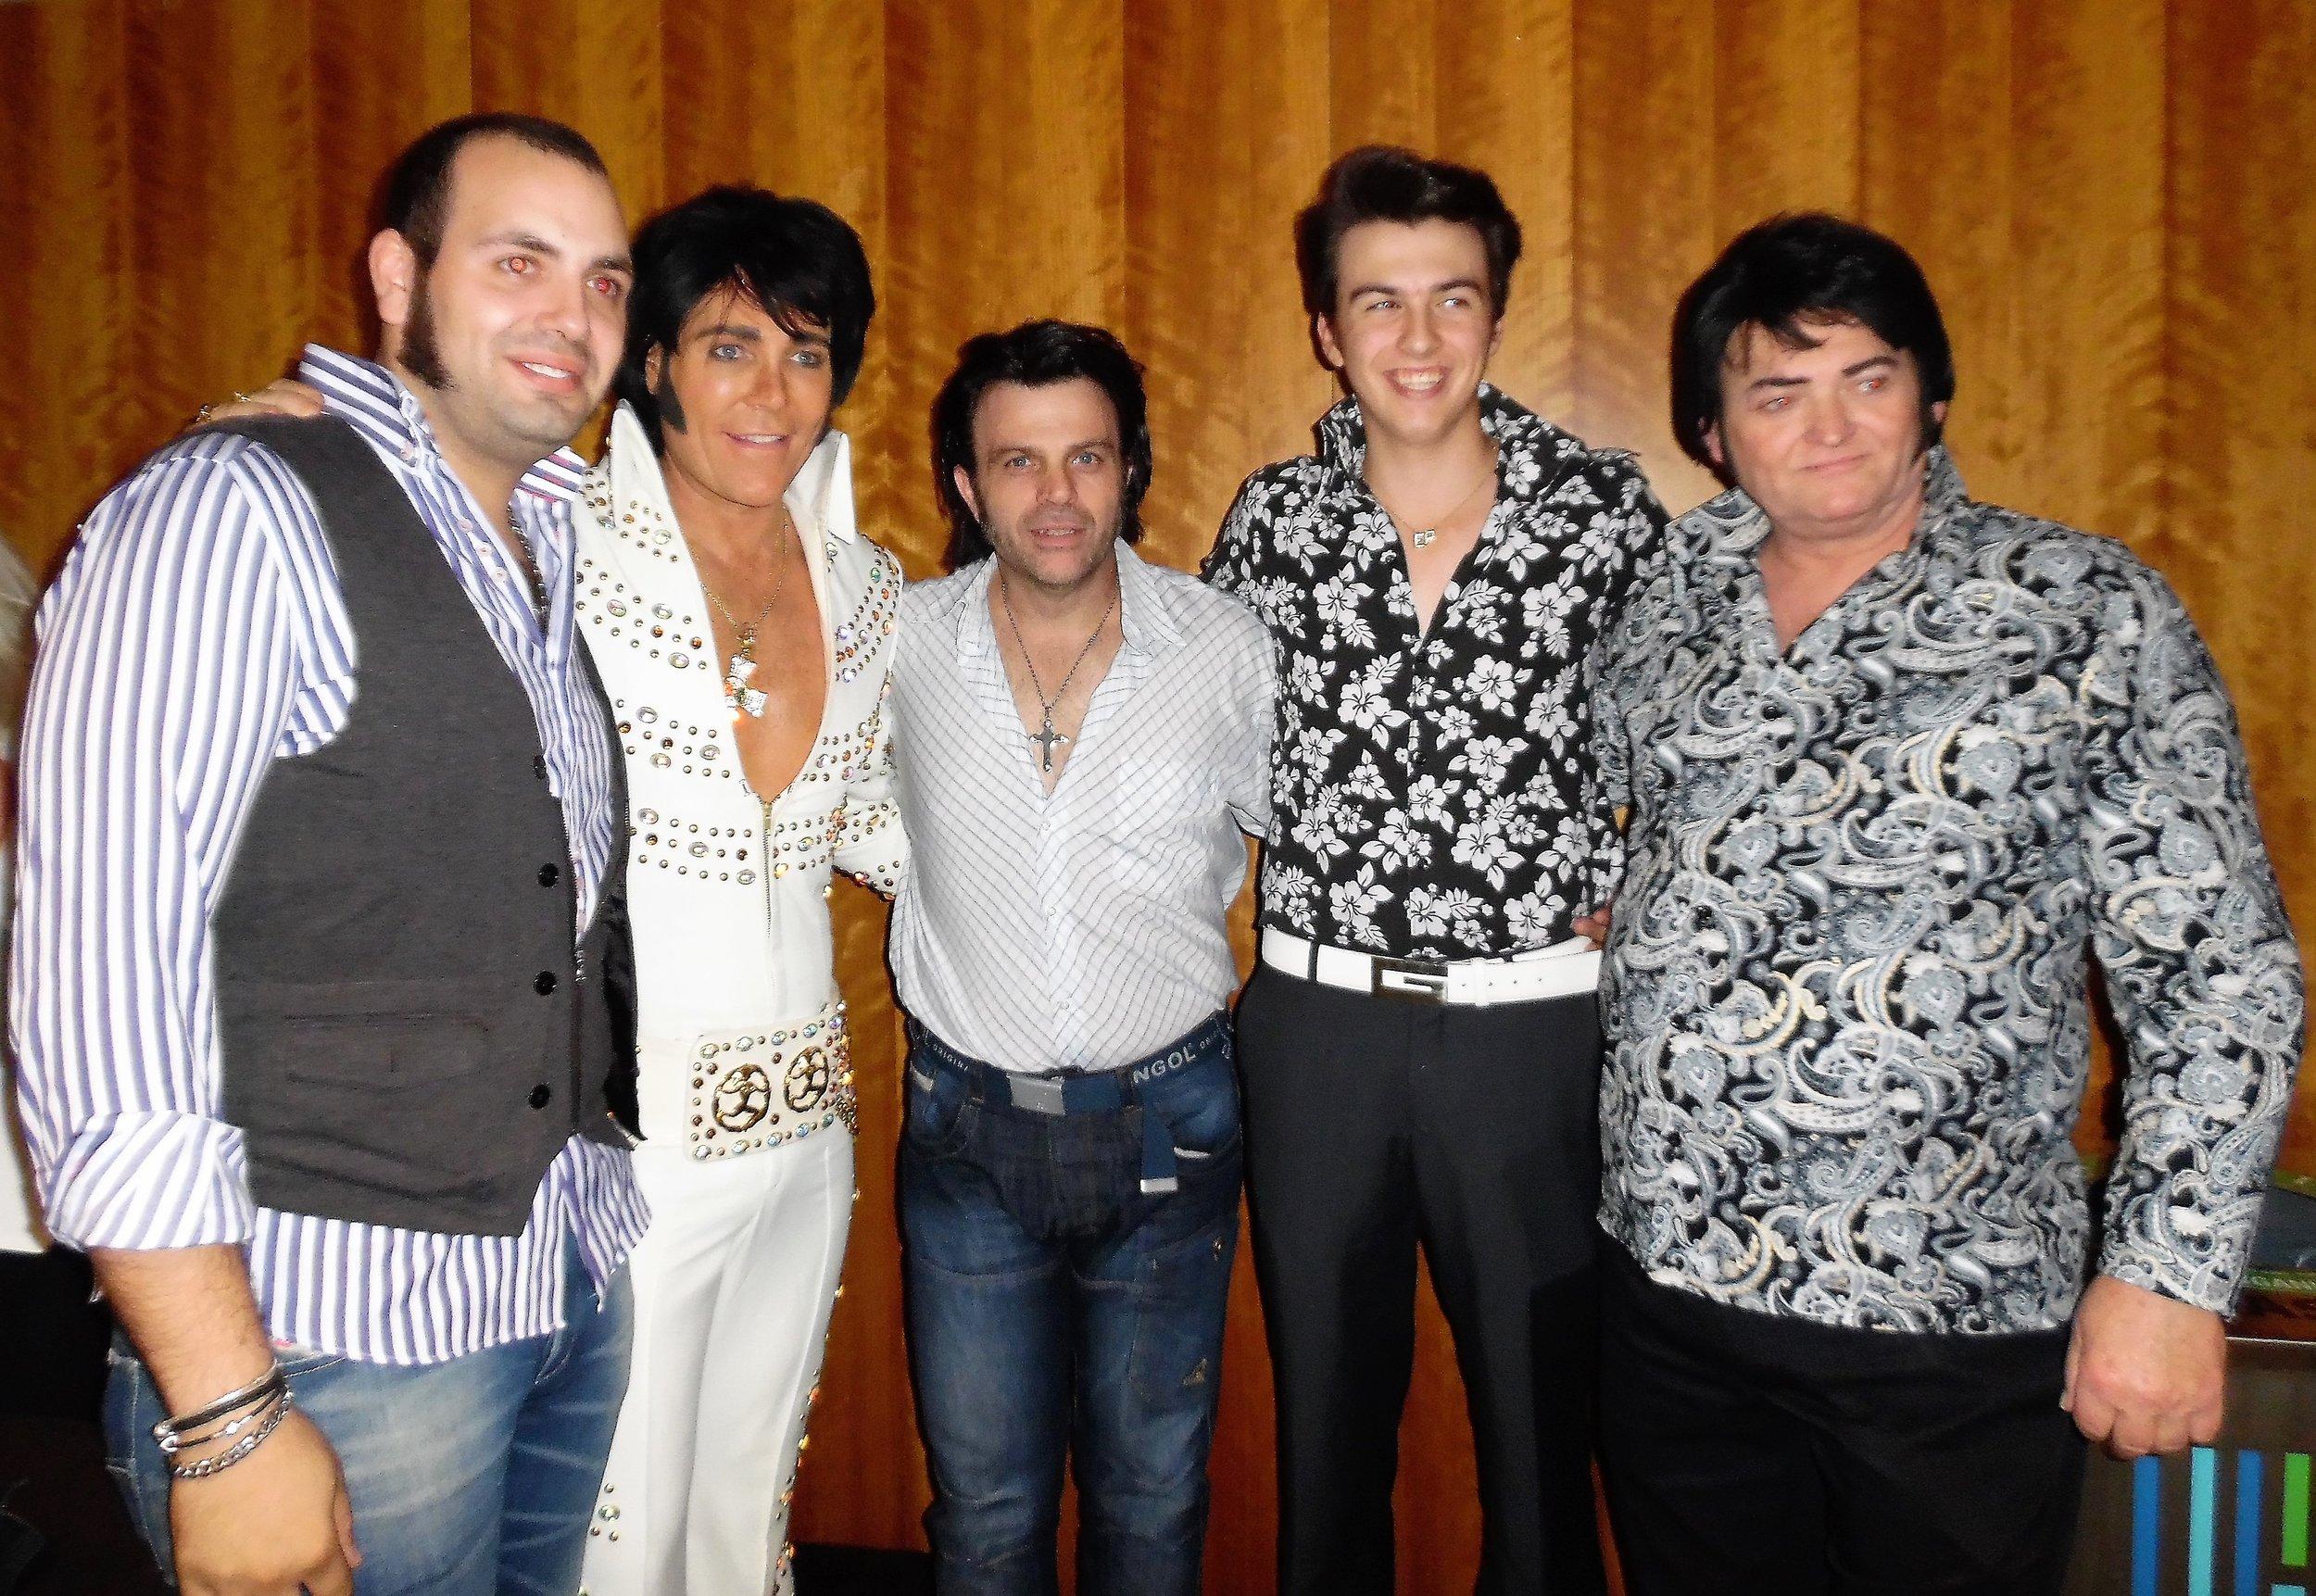 ETAs Bruno Nesci, Eric Evangelista, Rowan McLellan, and Gordie McNeil attended  Gordon Hendricks ' concert, Niagara Falls, October 21st, 2017.